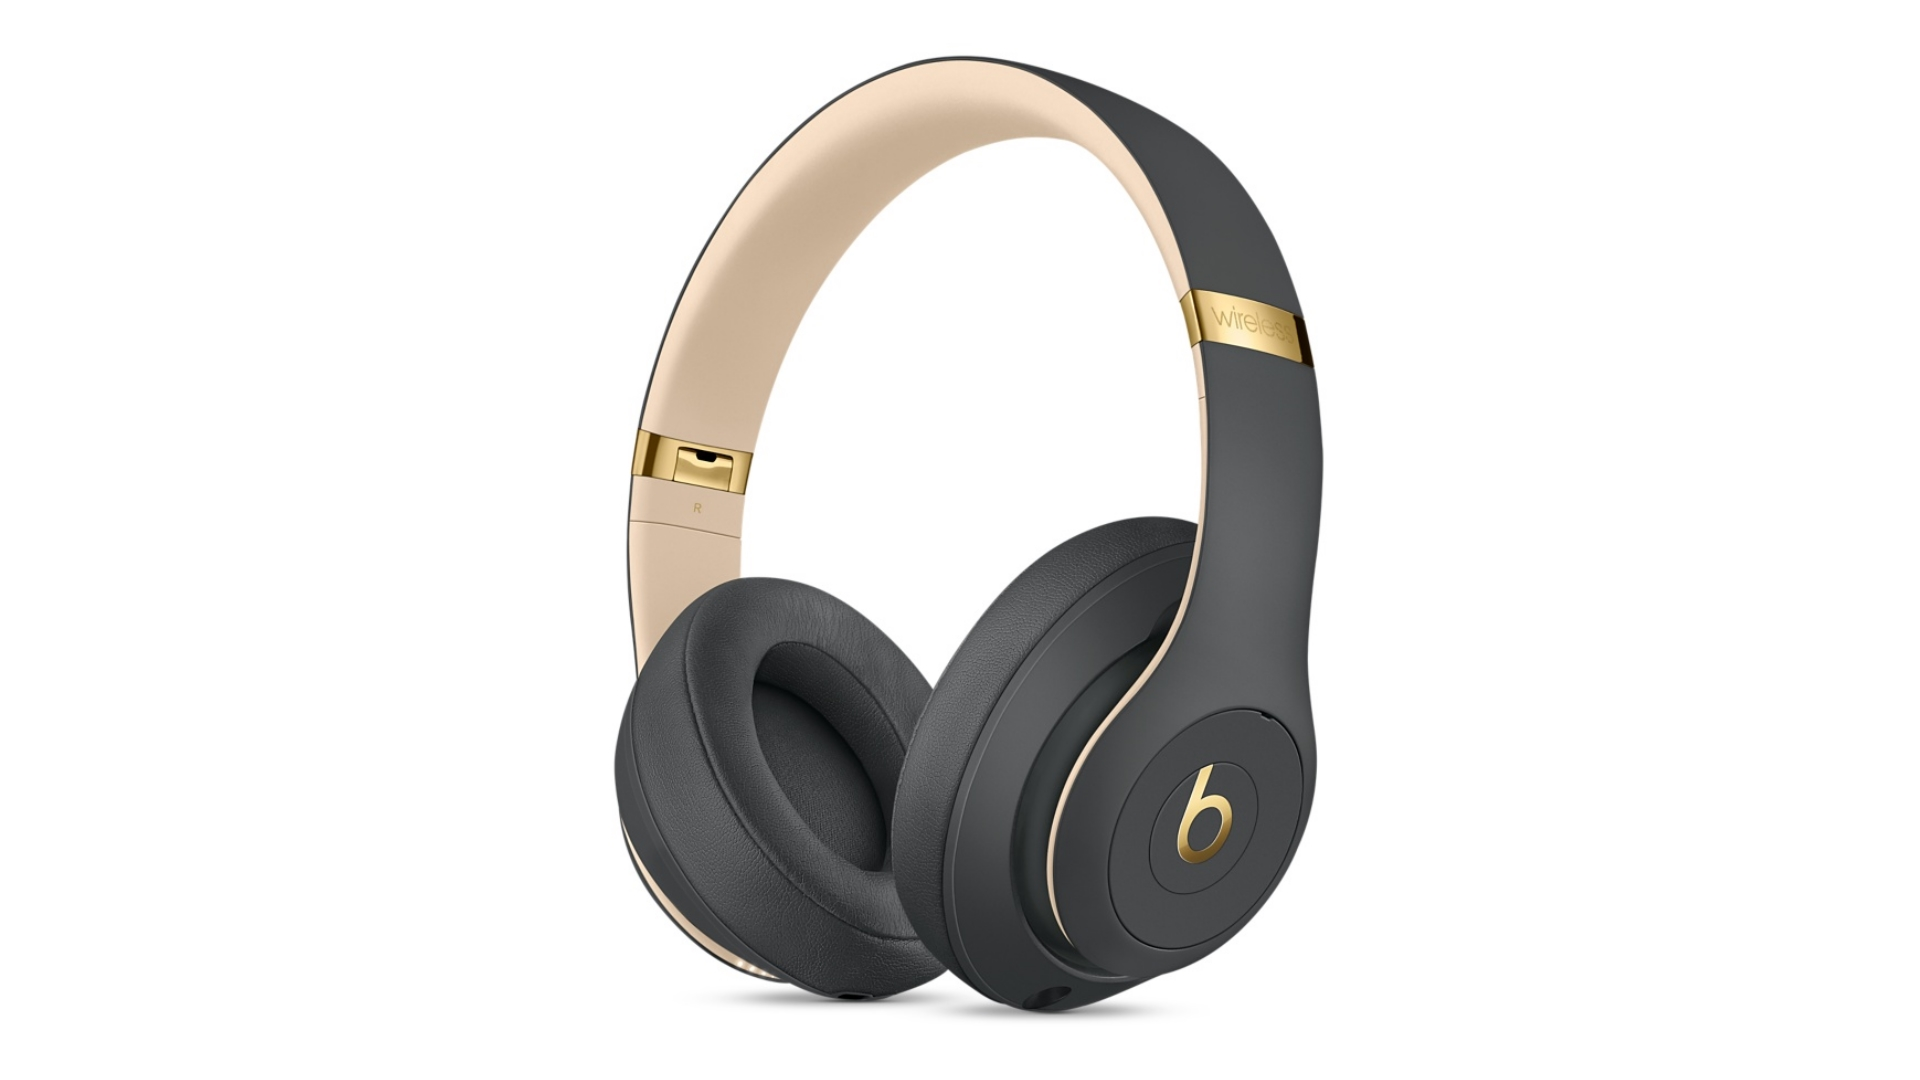 The cheapest Beats Studio3 Wireless prices